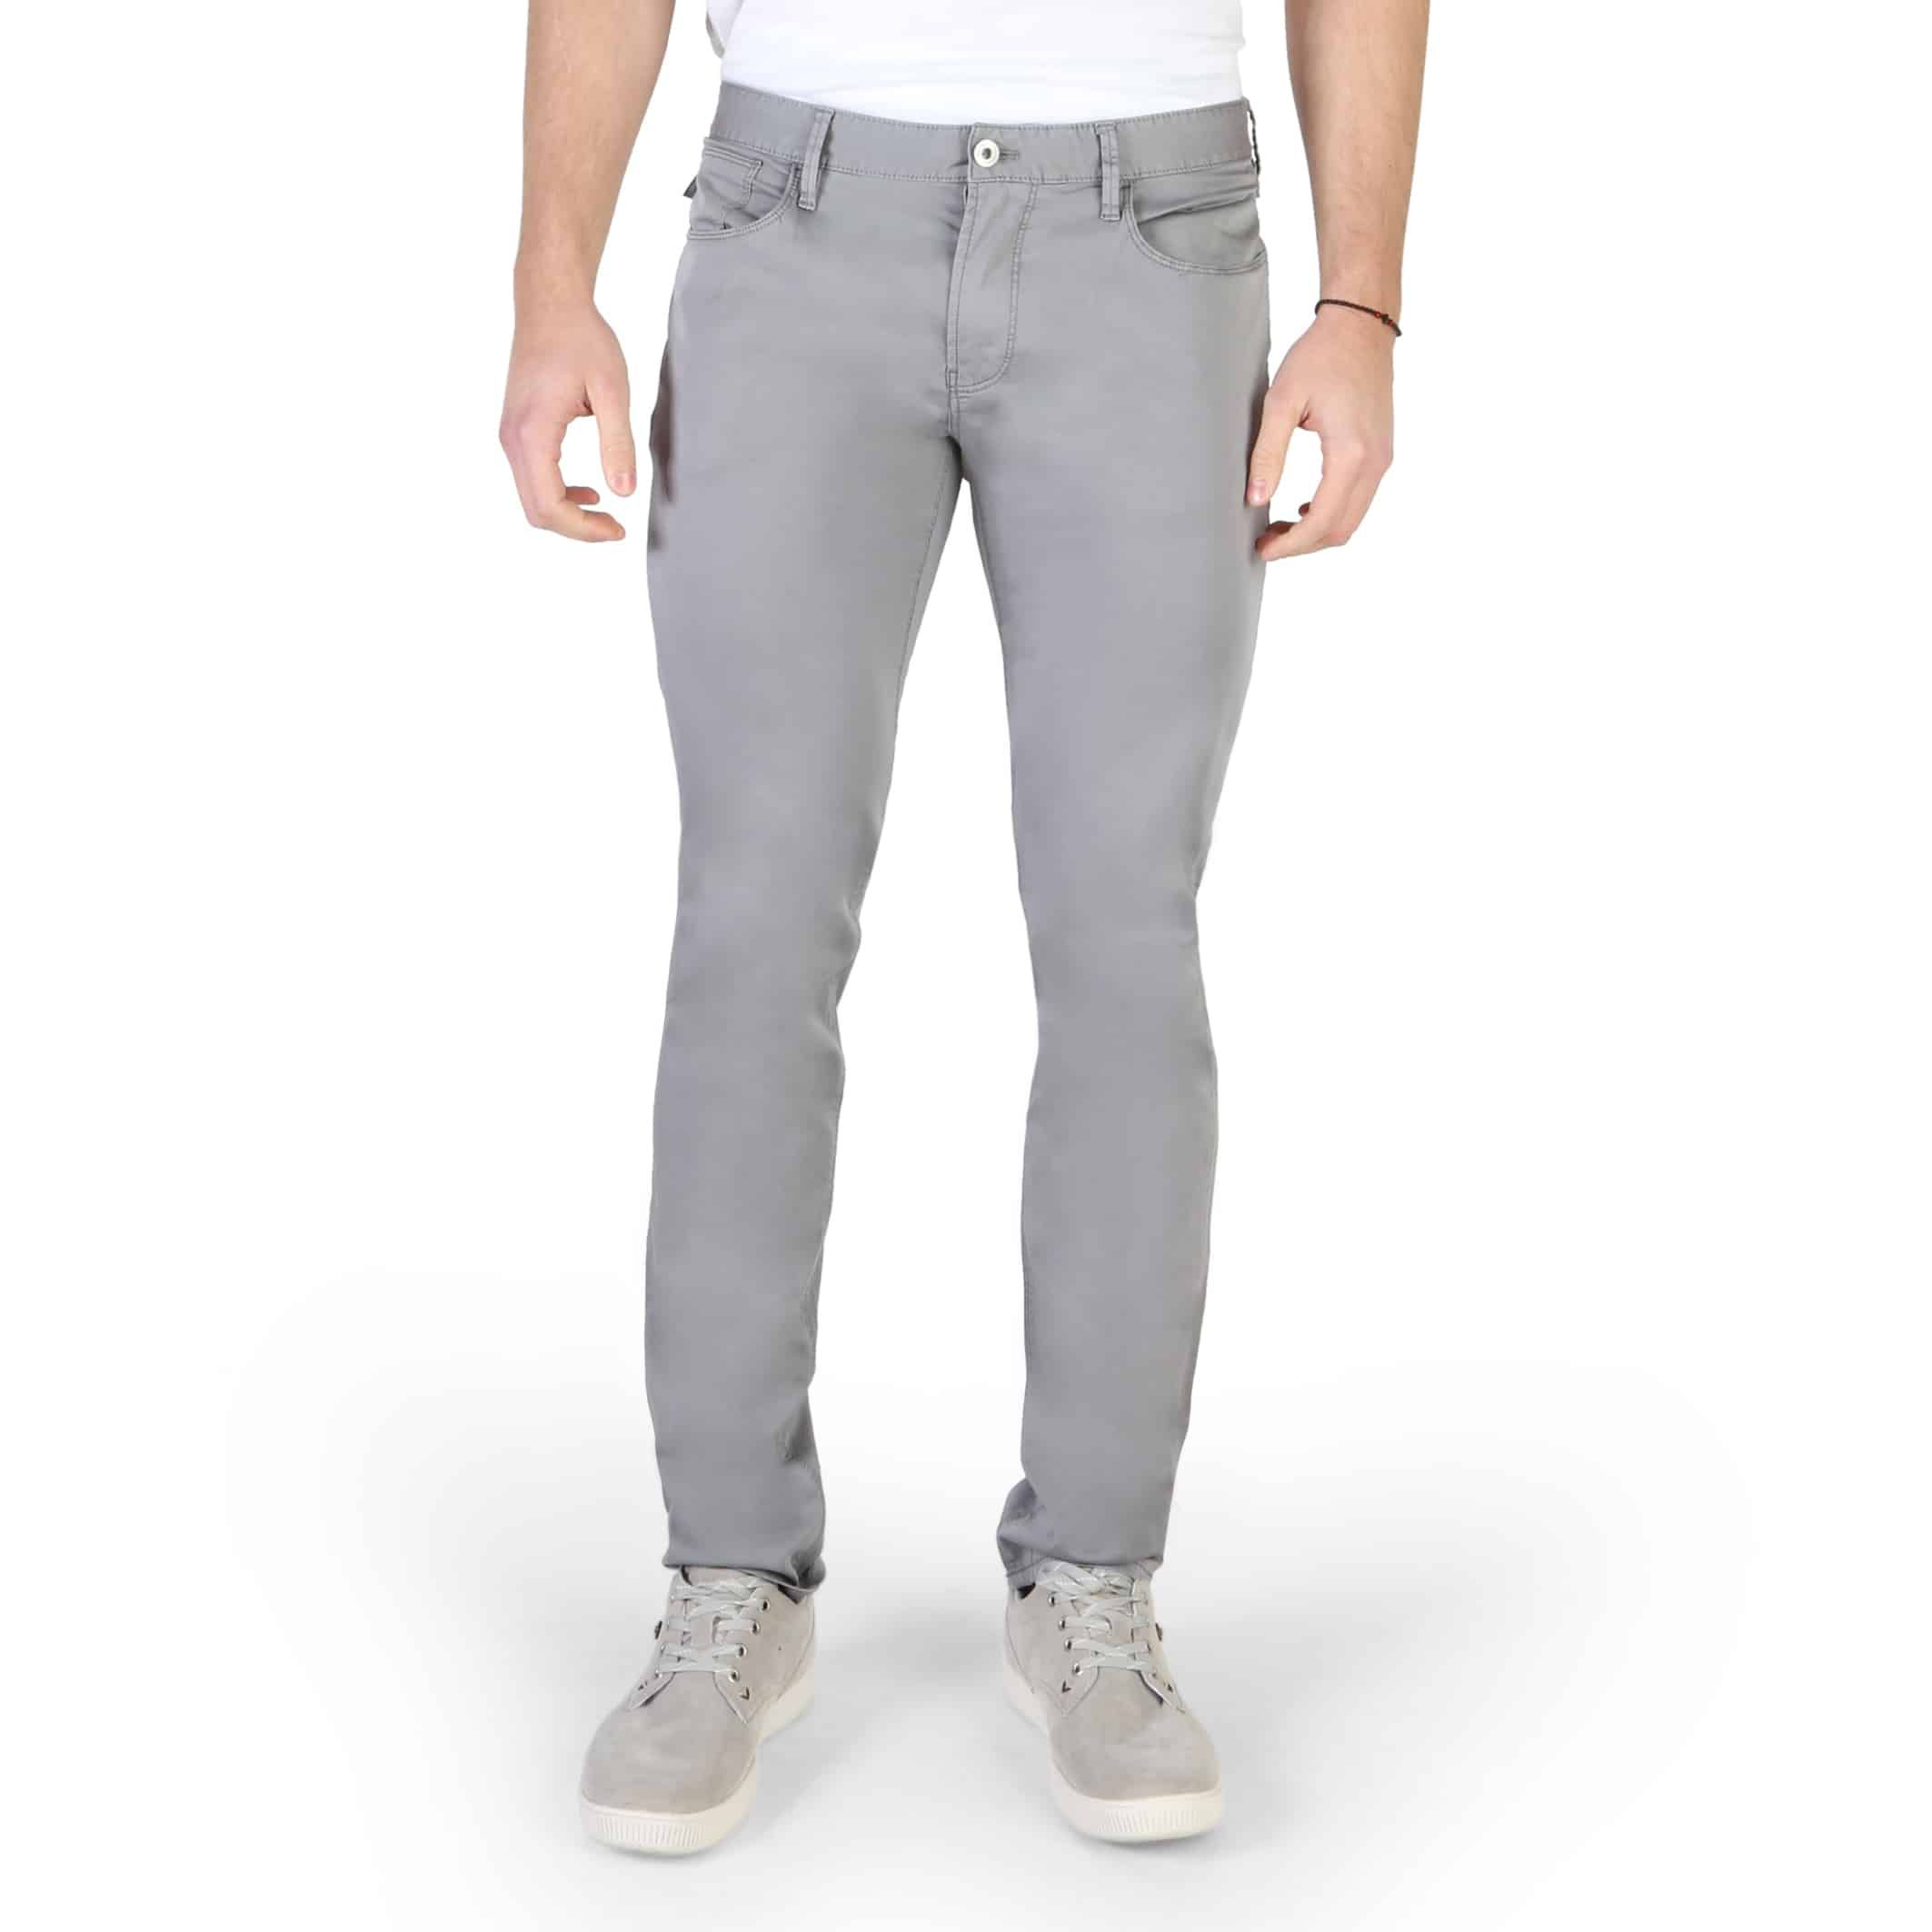 Armani Jeans – 3Y6J06_6NEDZ – Grigio